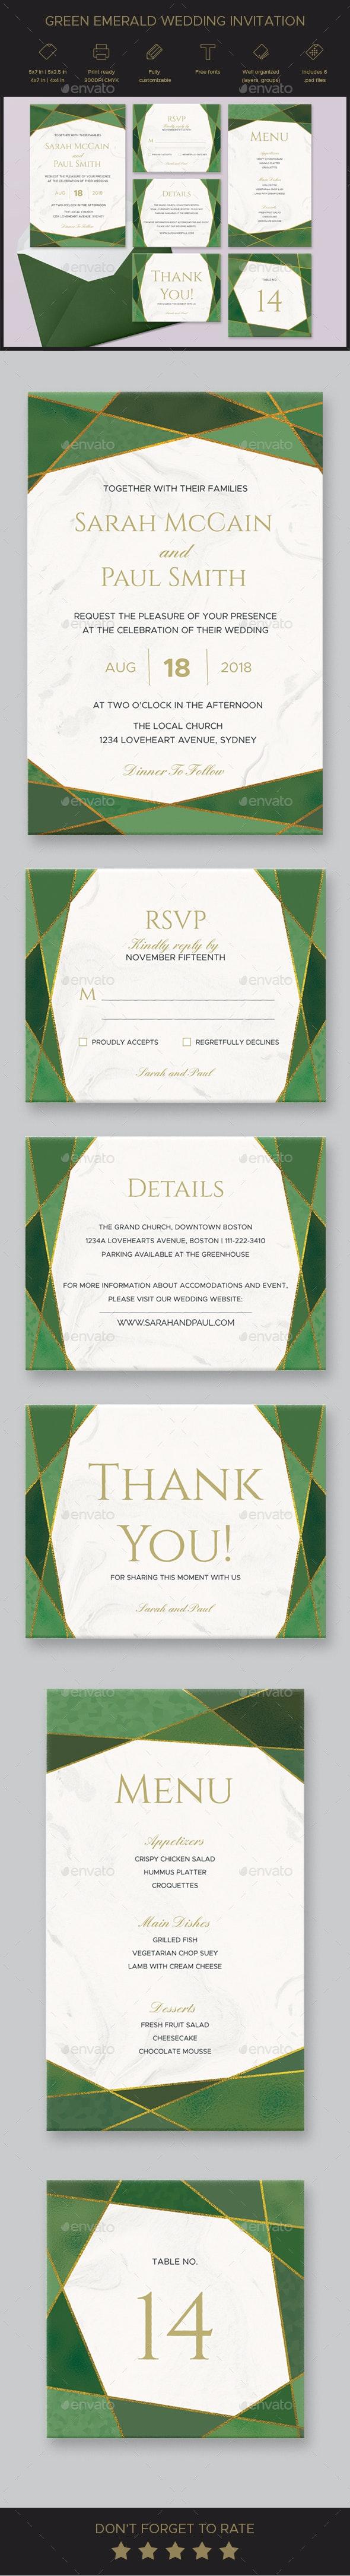 Green Emerald Wedding Invitation Set - Weddings Cards & Invites